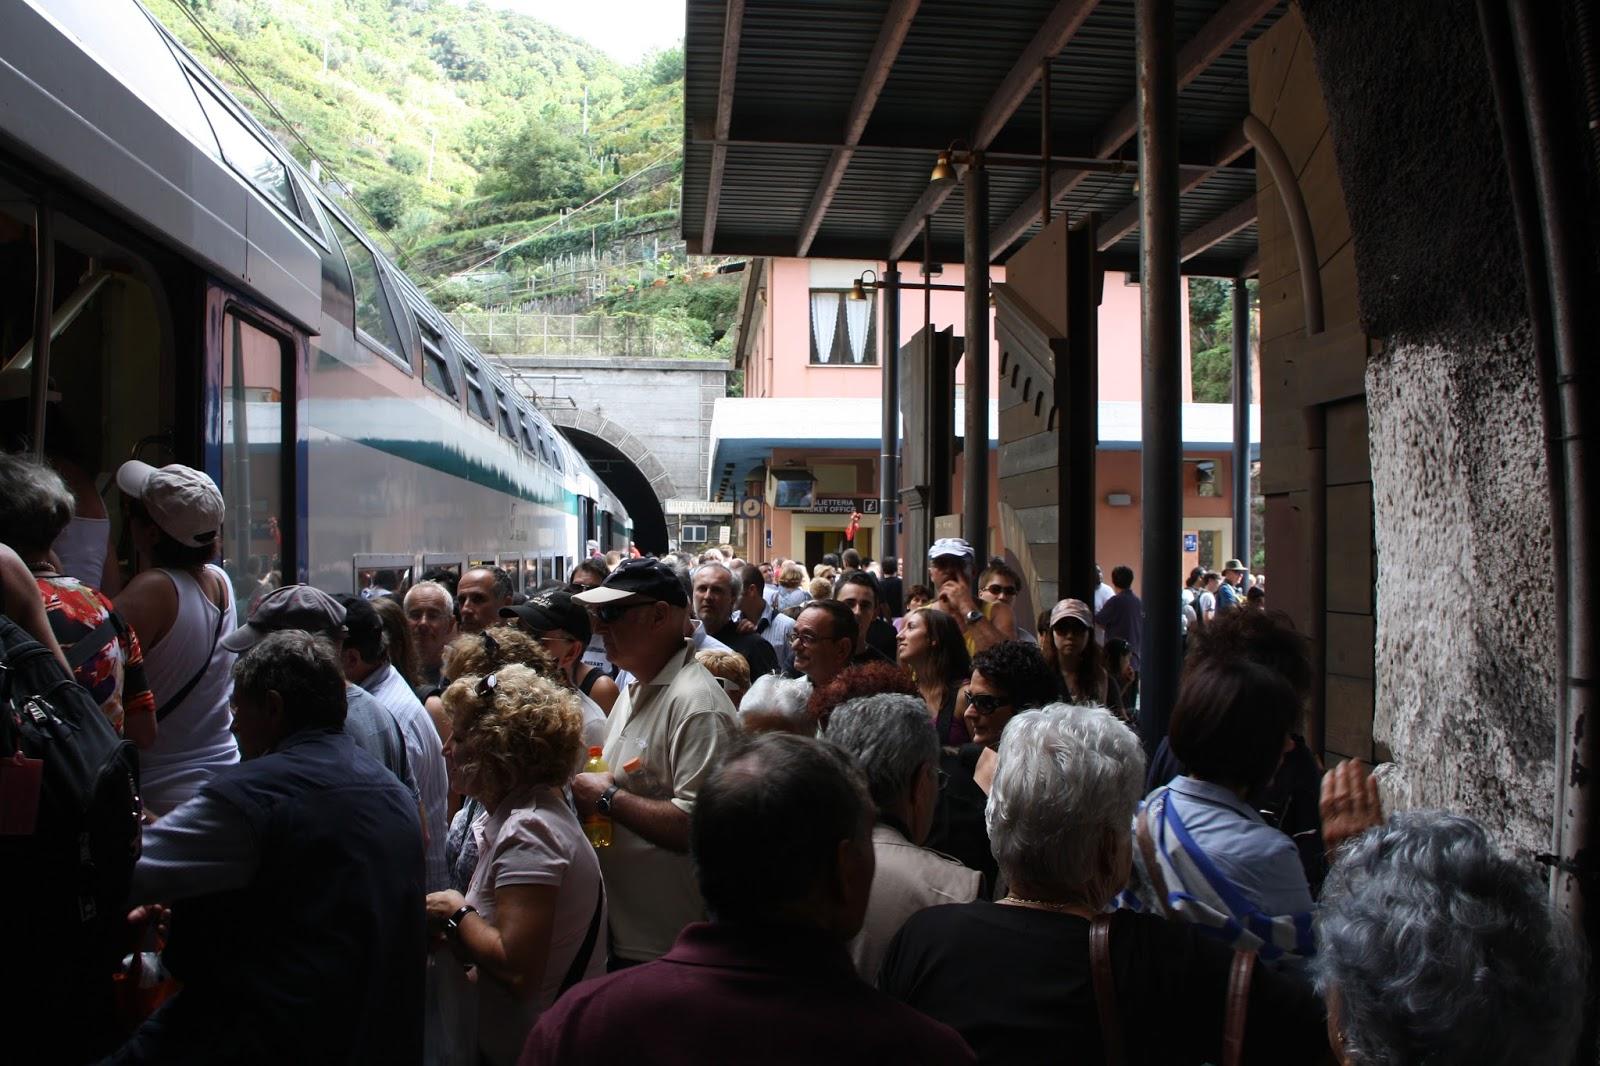 Travel By Train Vs Car In Italian Riviera